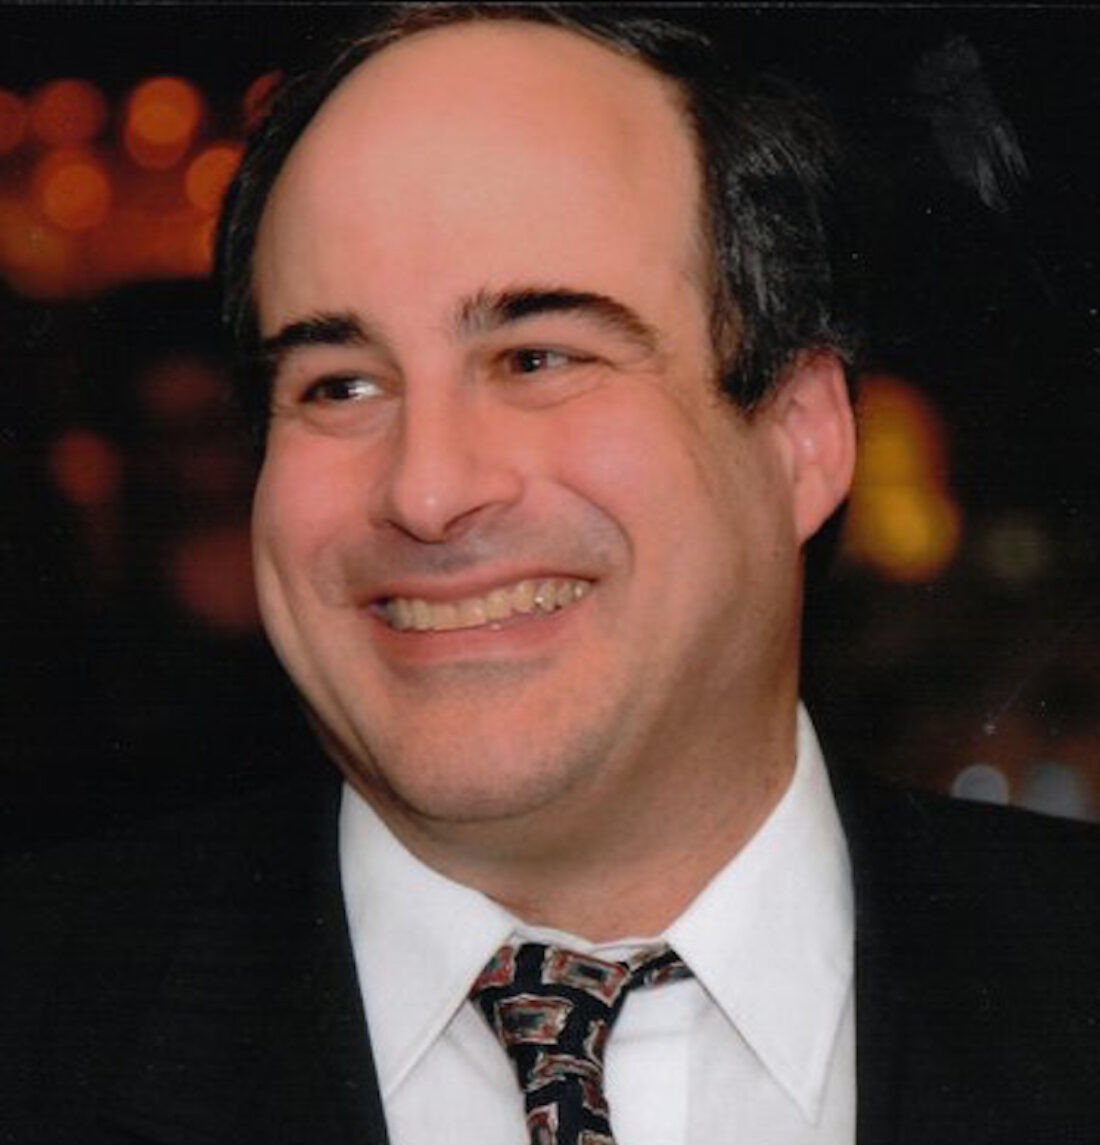 Eric Sirota